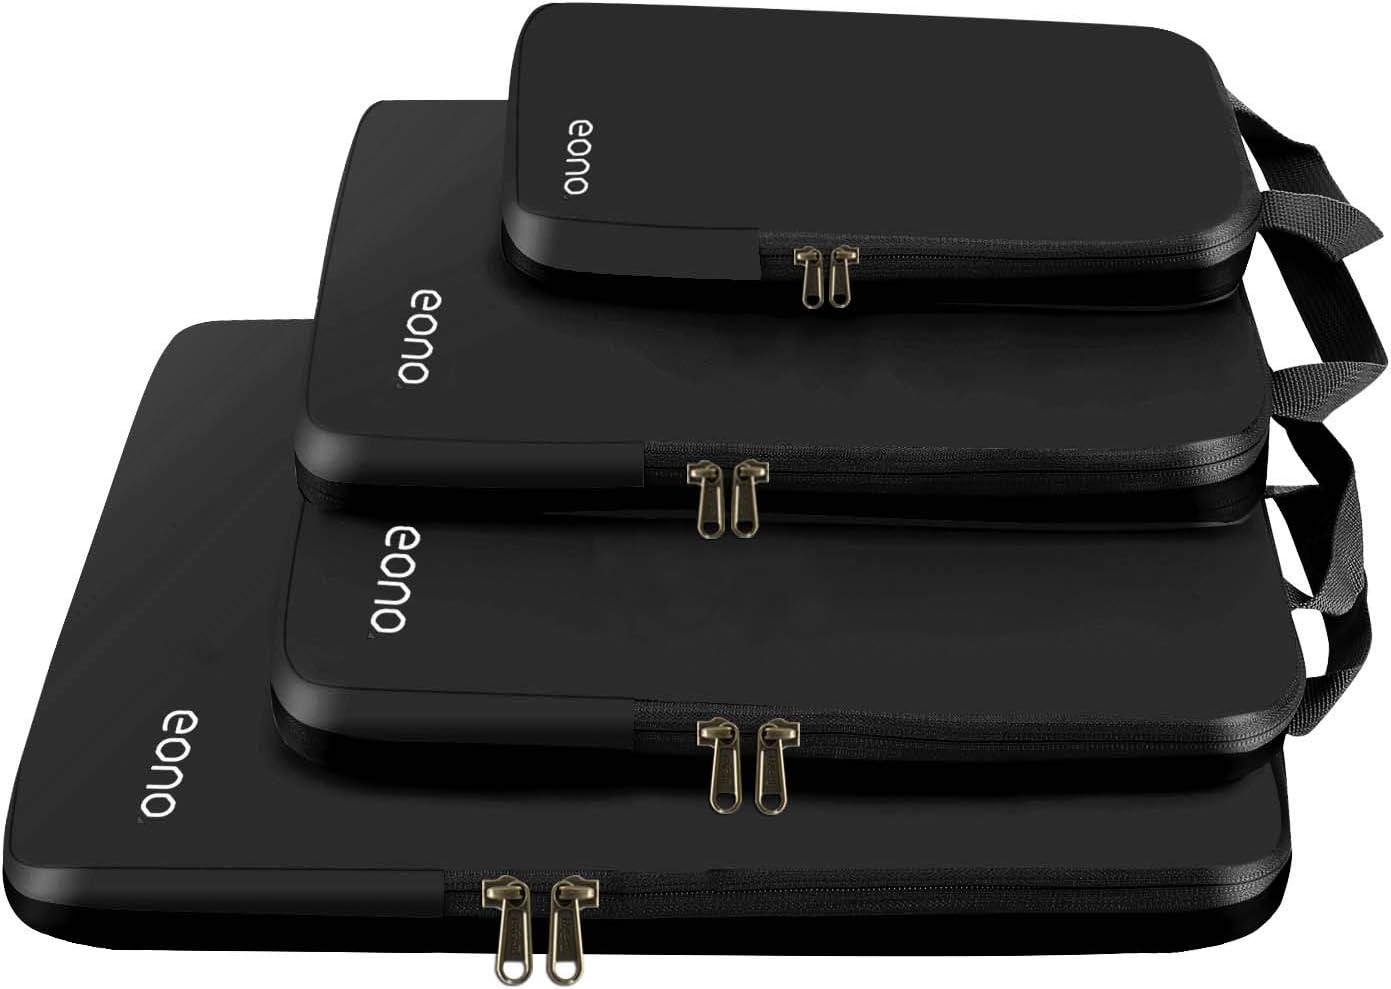 Eono by Amazon - Organizadores de Viaje de compresión expandibles, Impermeable Organizador para Maletas, Organizador de Equipaje, Cubos de Embalaje, Compression Packing Cubes, Negro, 4 Set